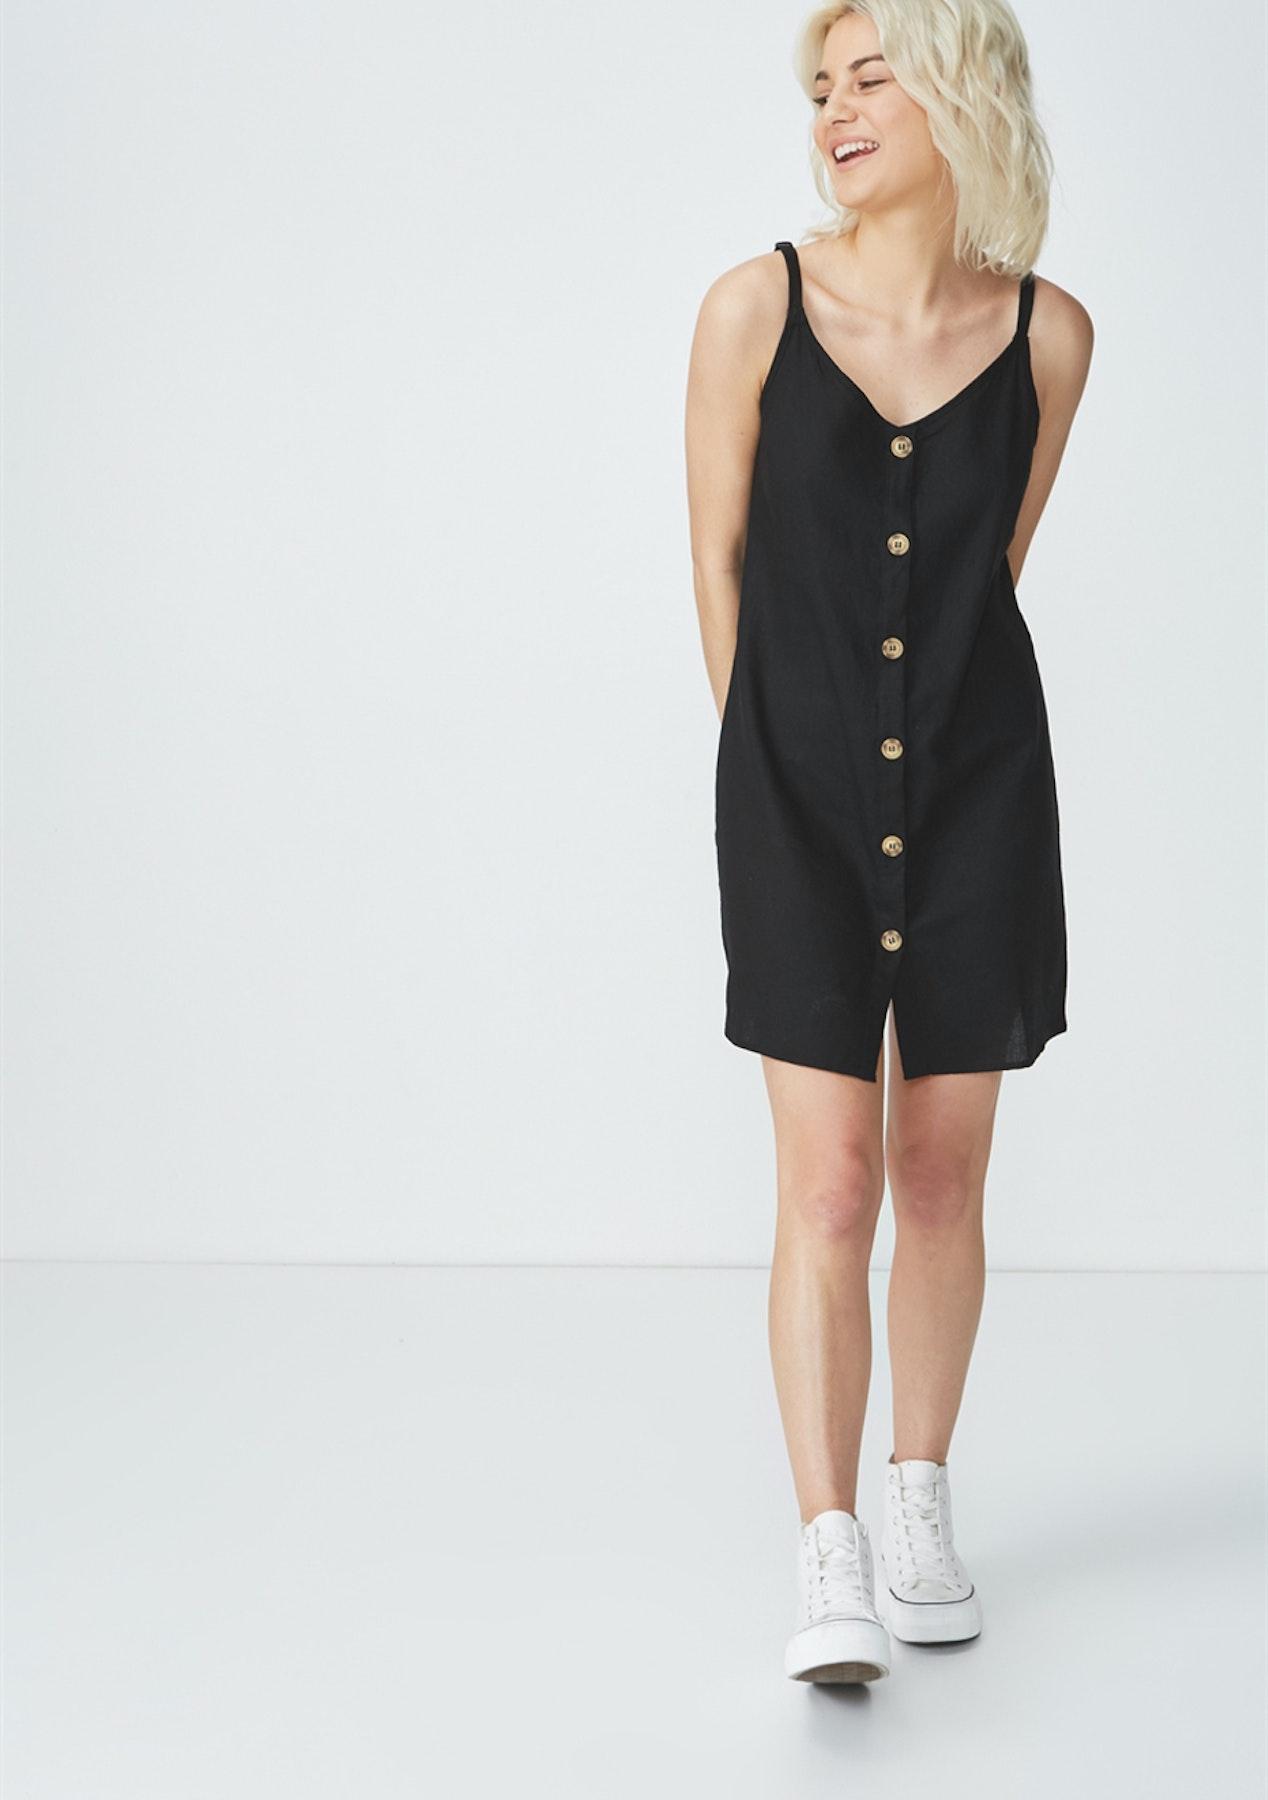 444e275f07d80c Cotton On - Woven Margot Slip Dress/Button Through Black - Cotton On Mega  Sale! 500+ - Onceit